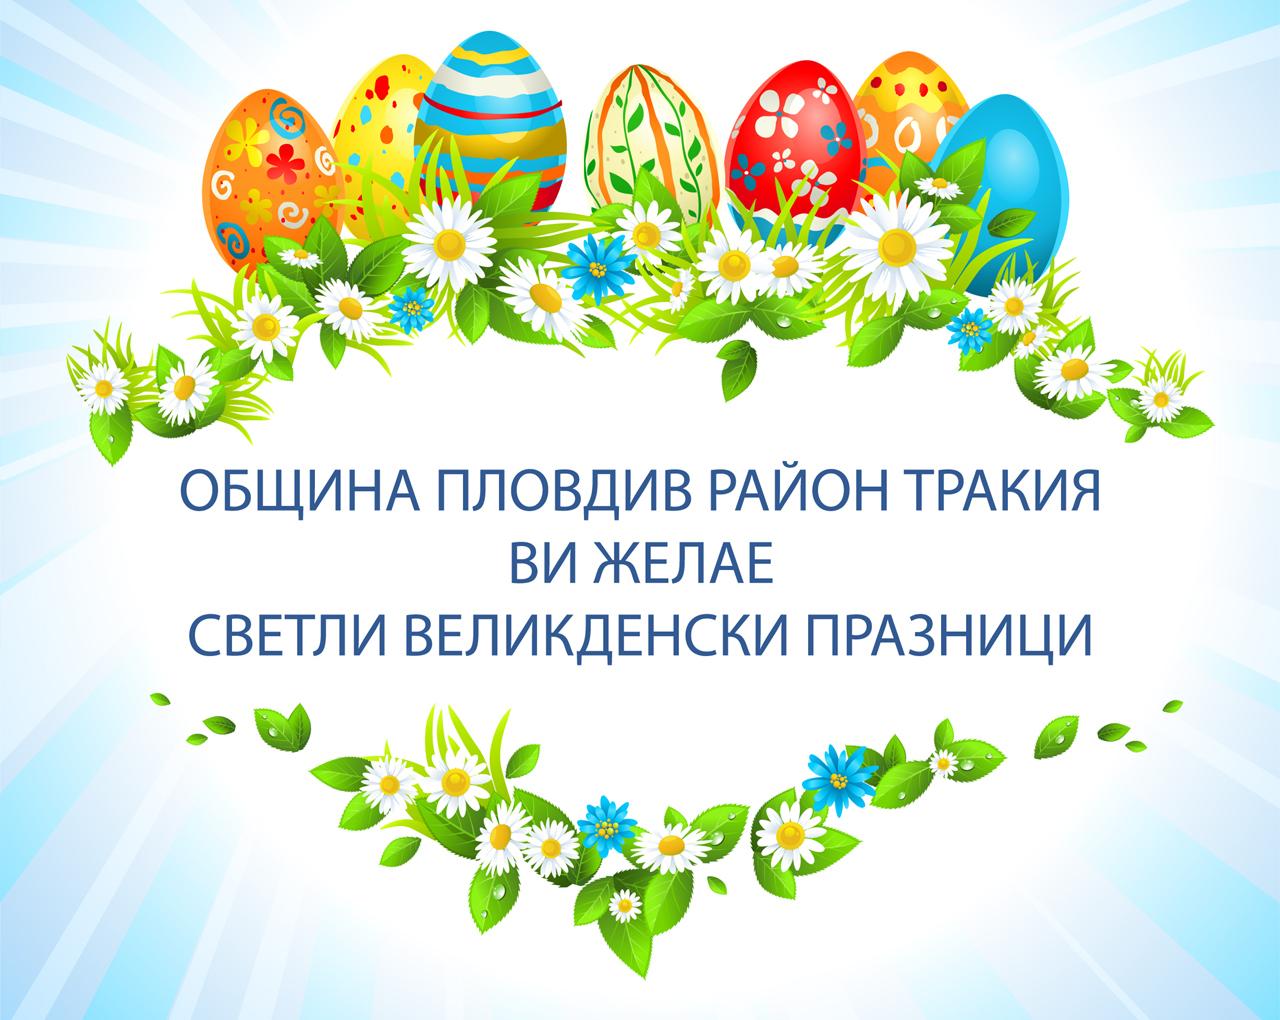 Община Пловдив Район Тракия ви желае Светли Великденски Празници